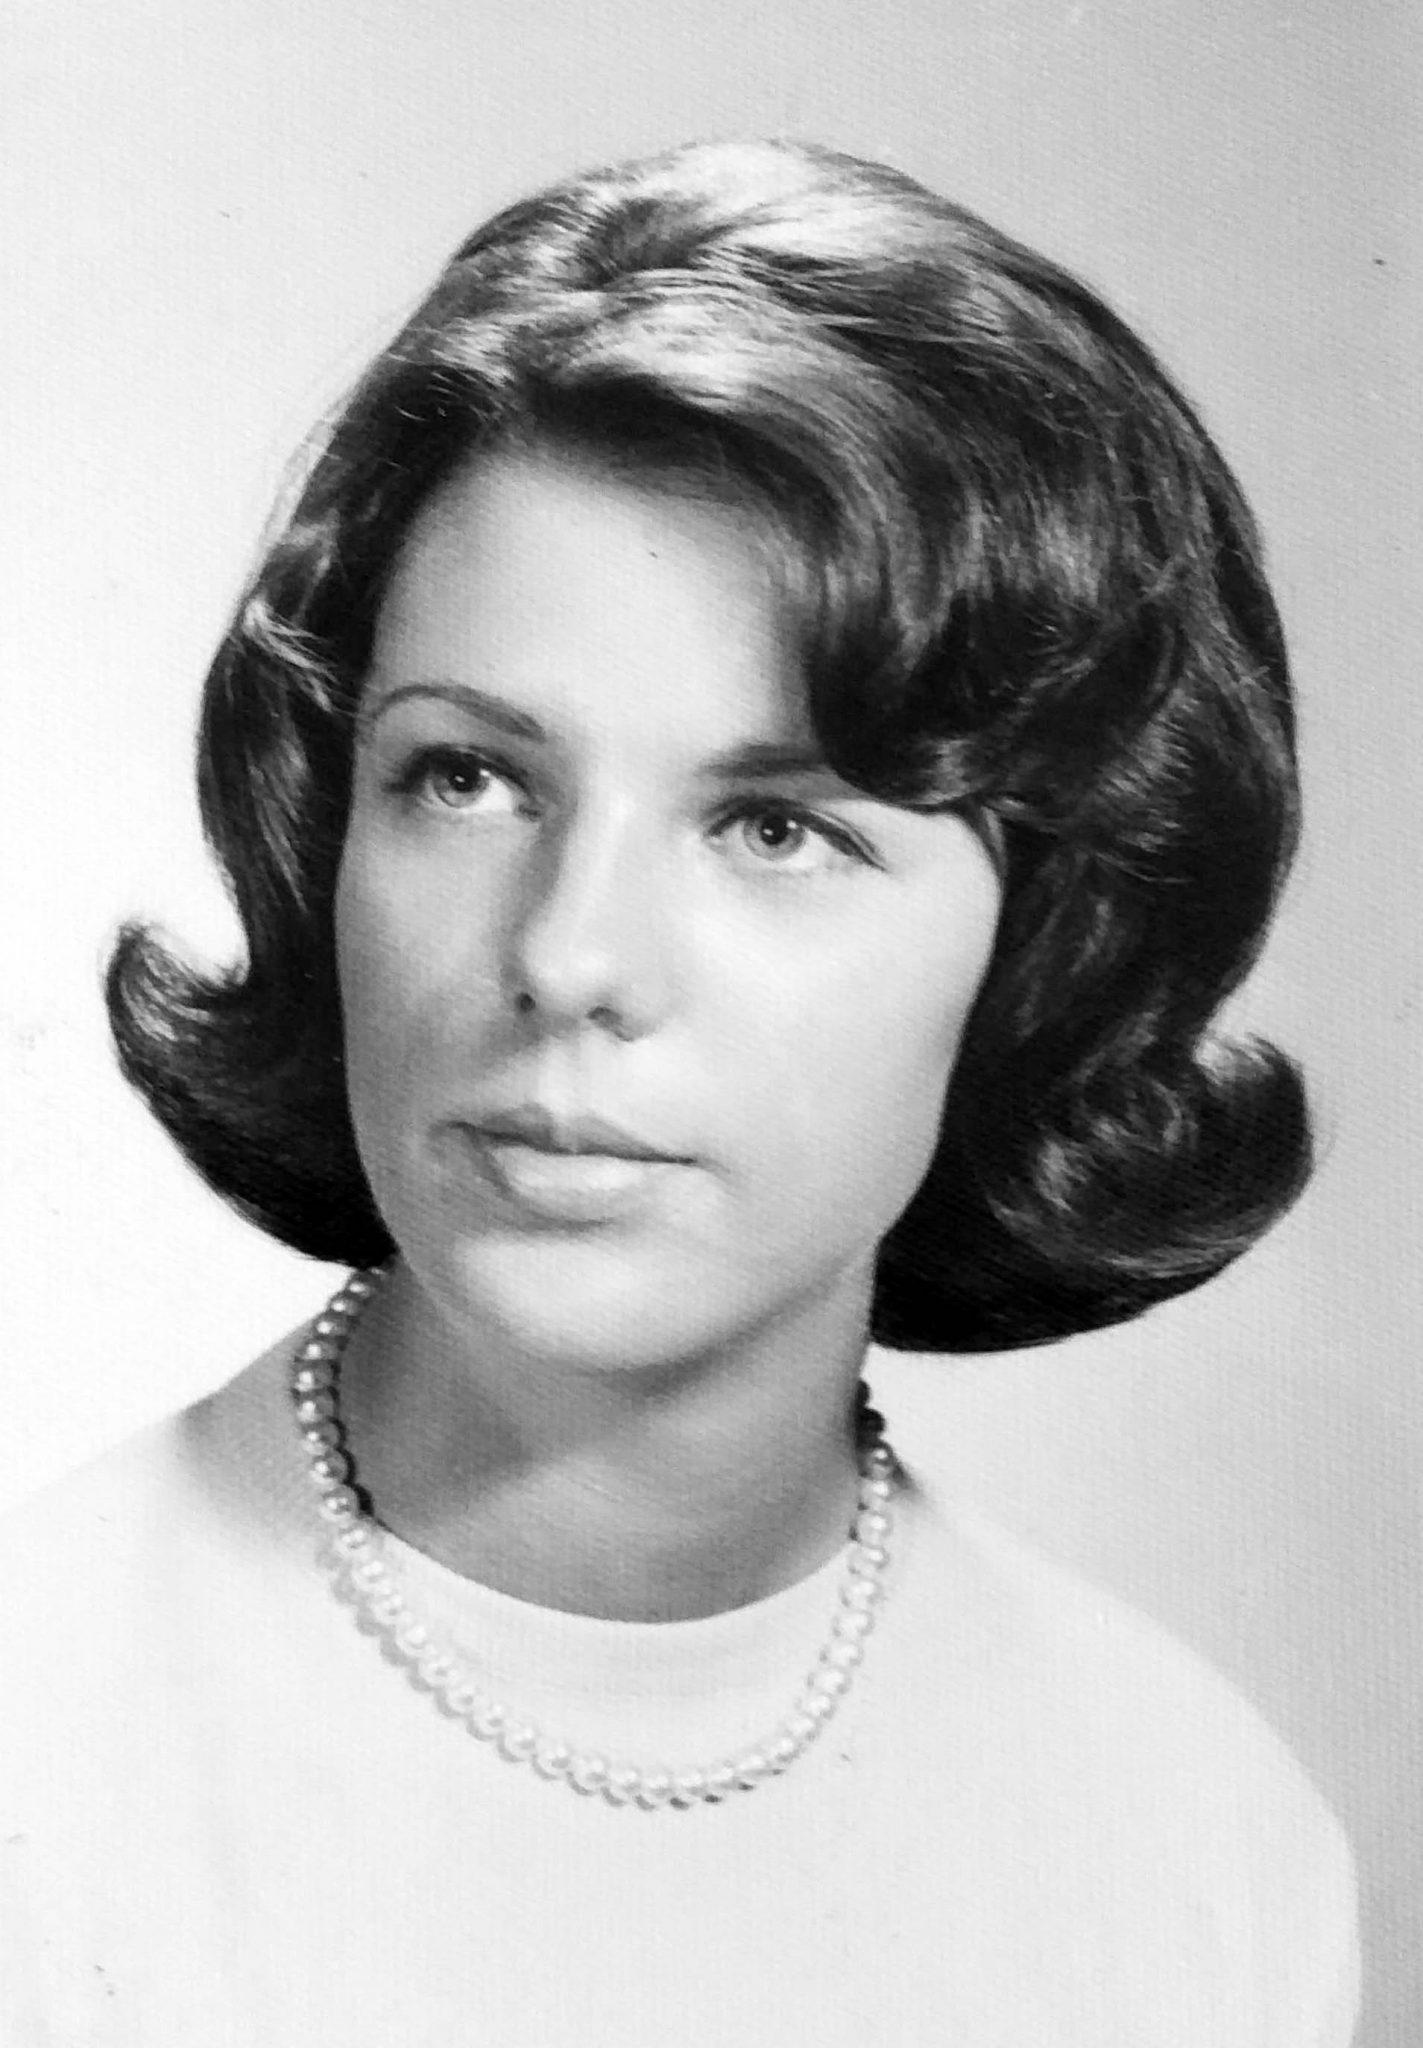 Susan Margaret Pitts